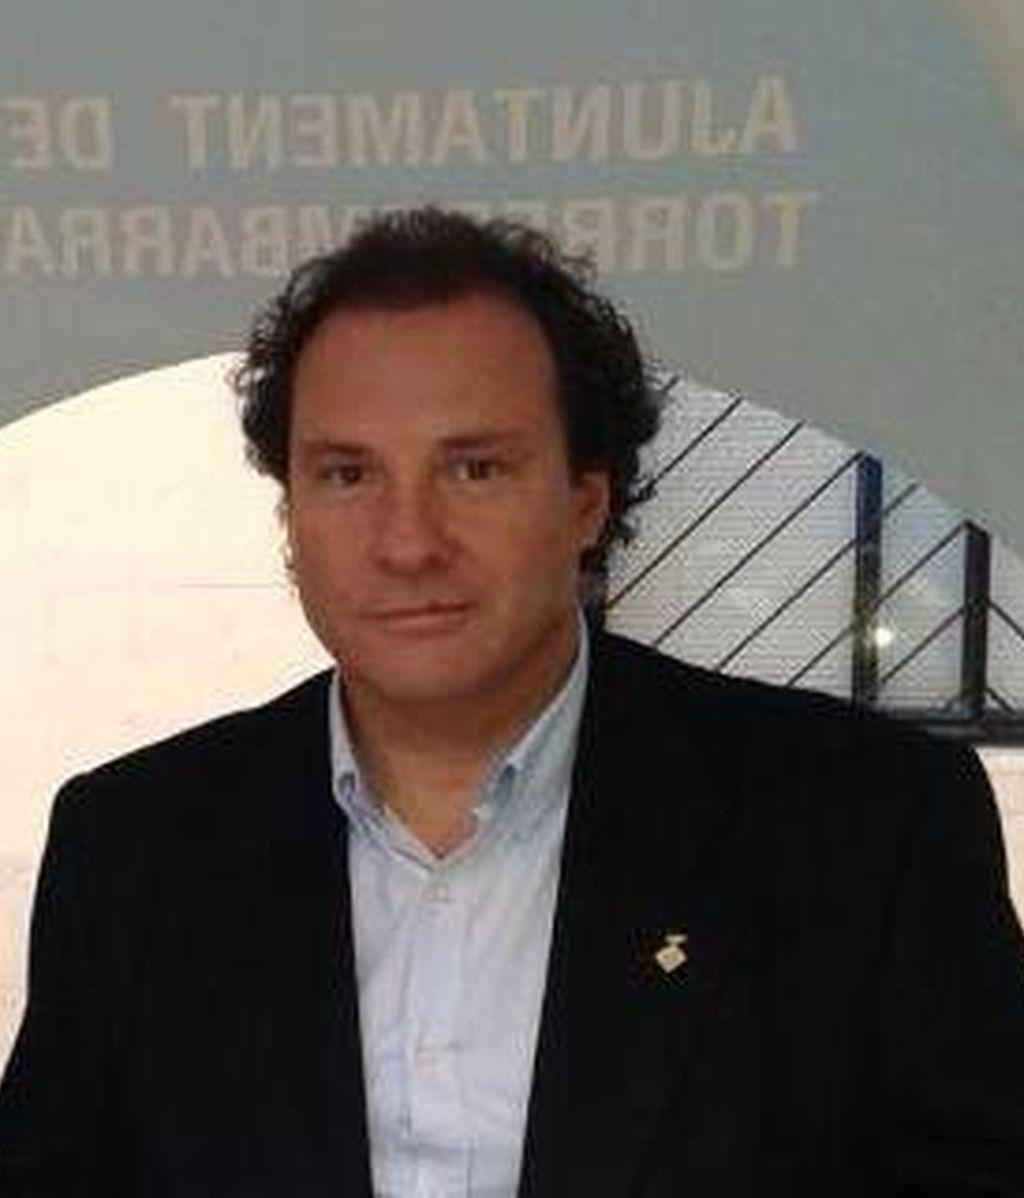 Detenido el alcalde de Torredembarra tras un registro de la Guardia Civil